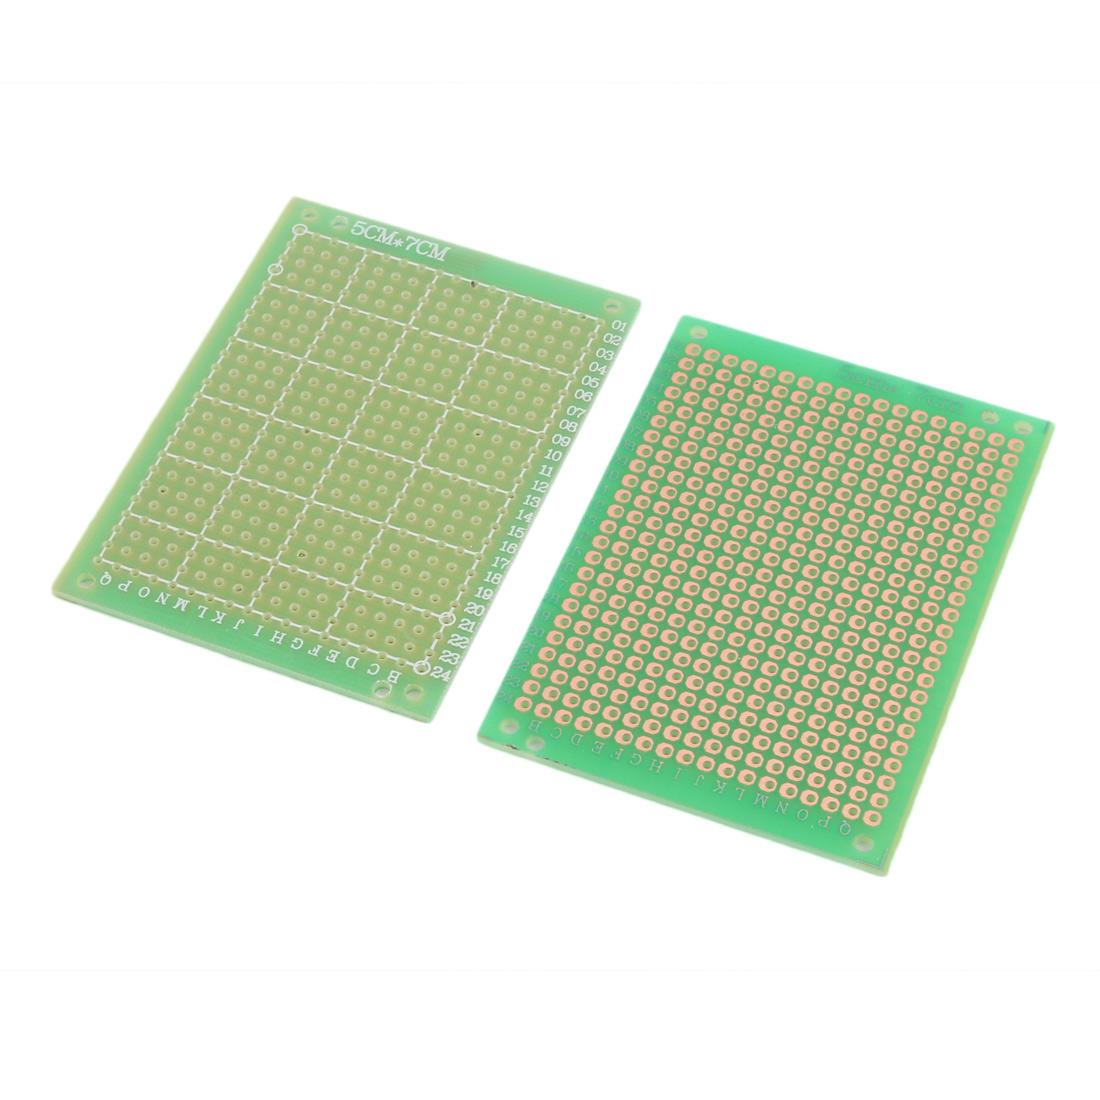 2 Pcs Copper Prototyping PCB Circuit Board Stripboard 70x50mm